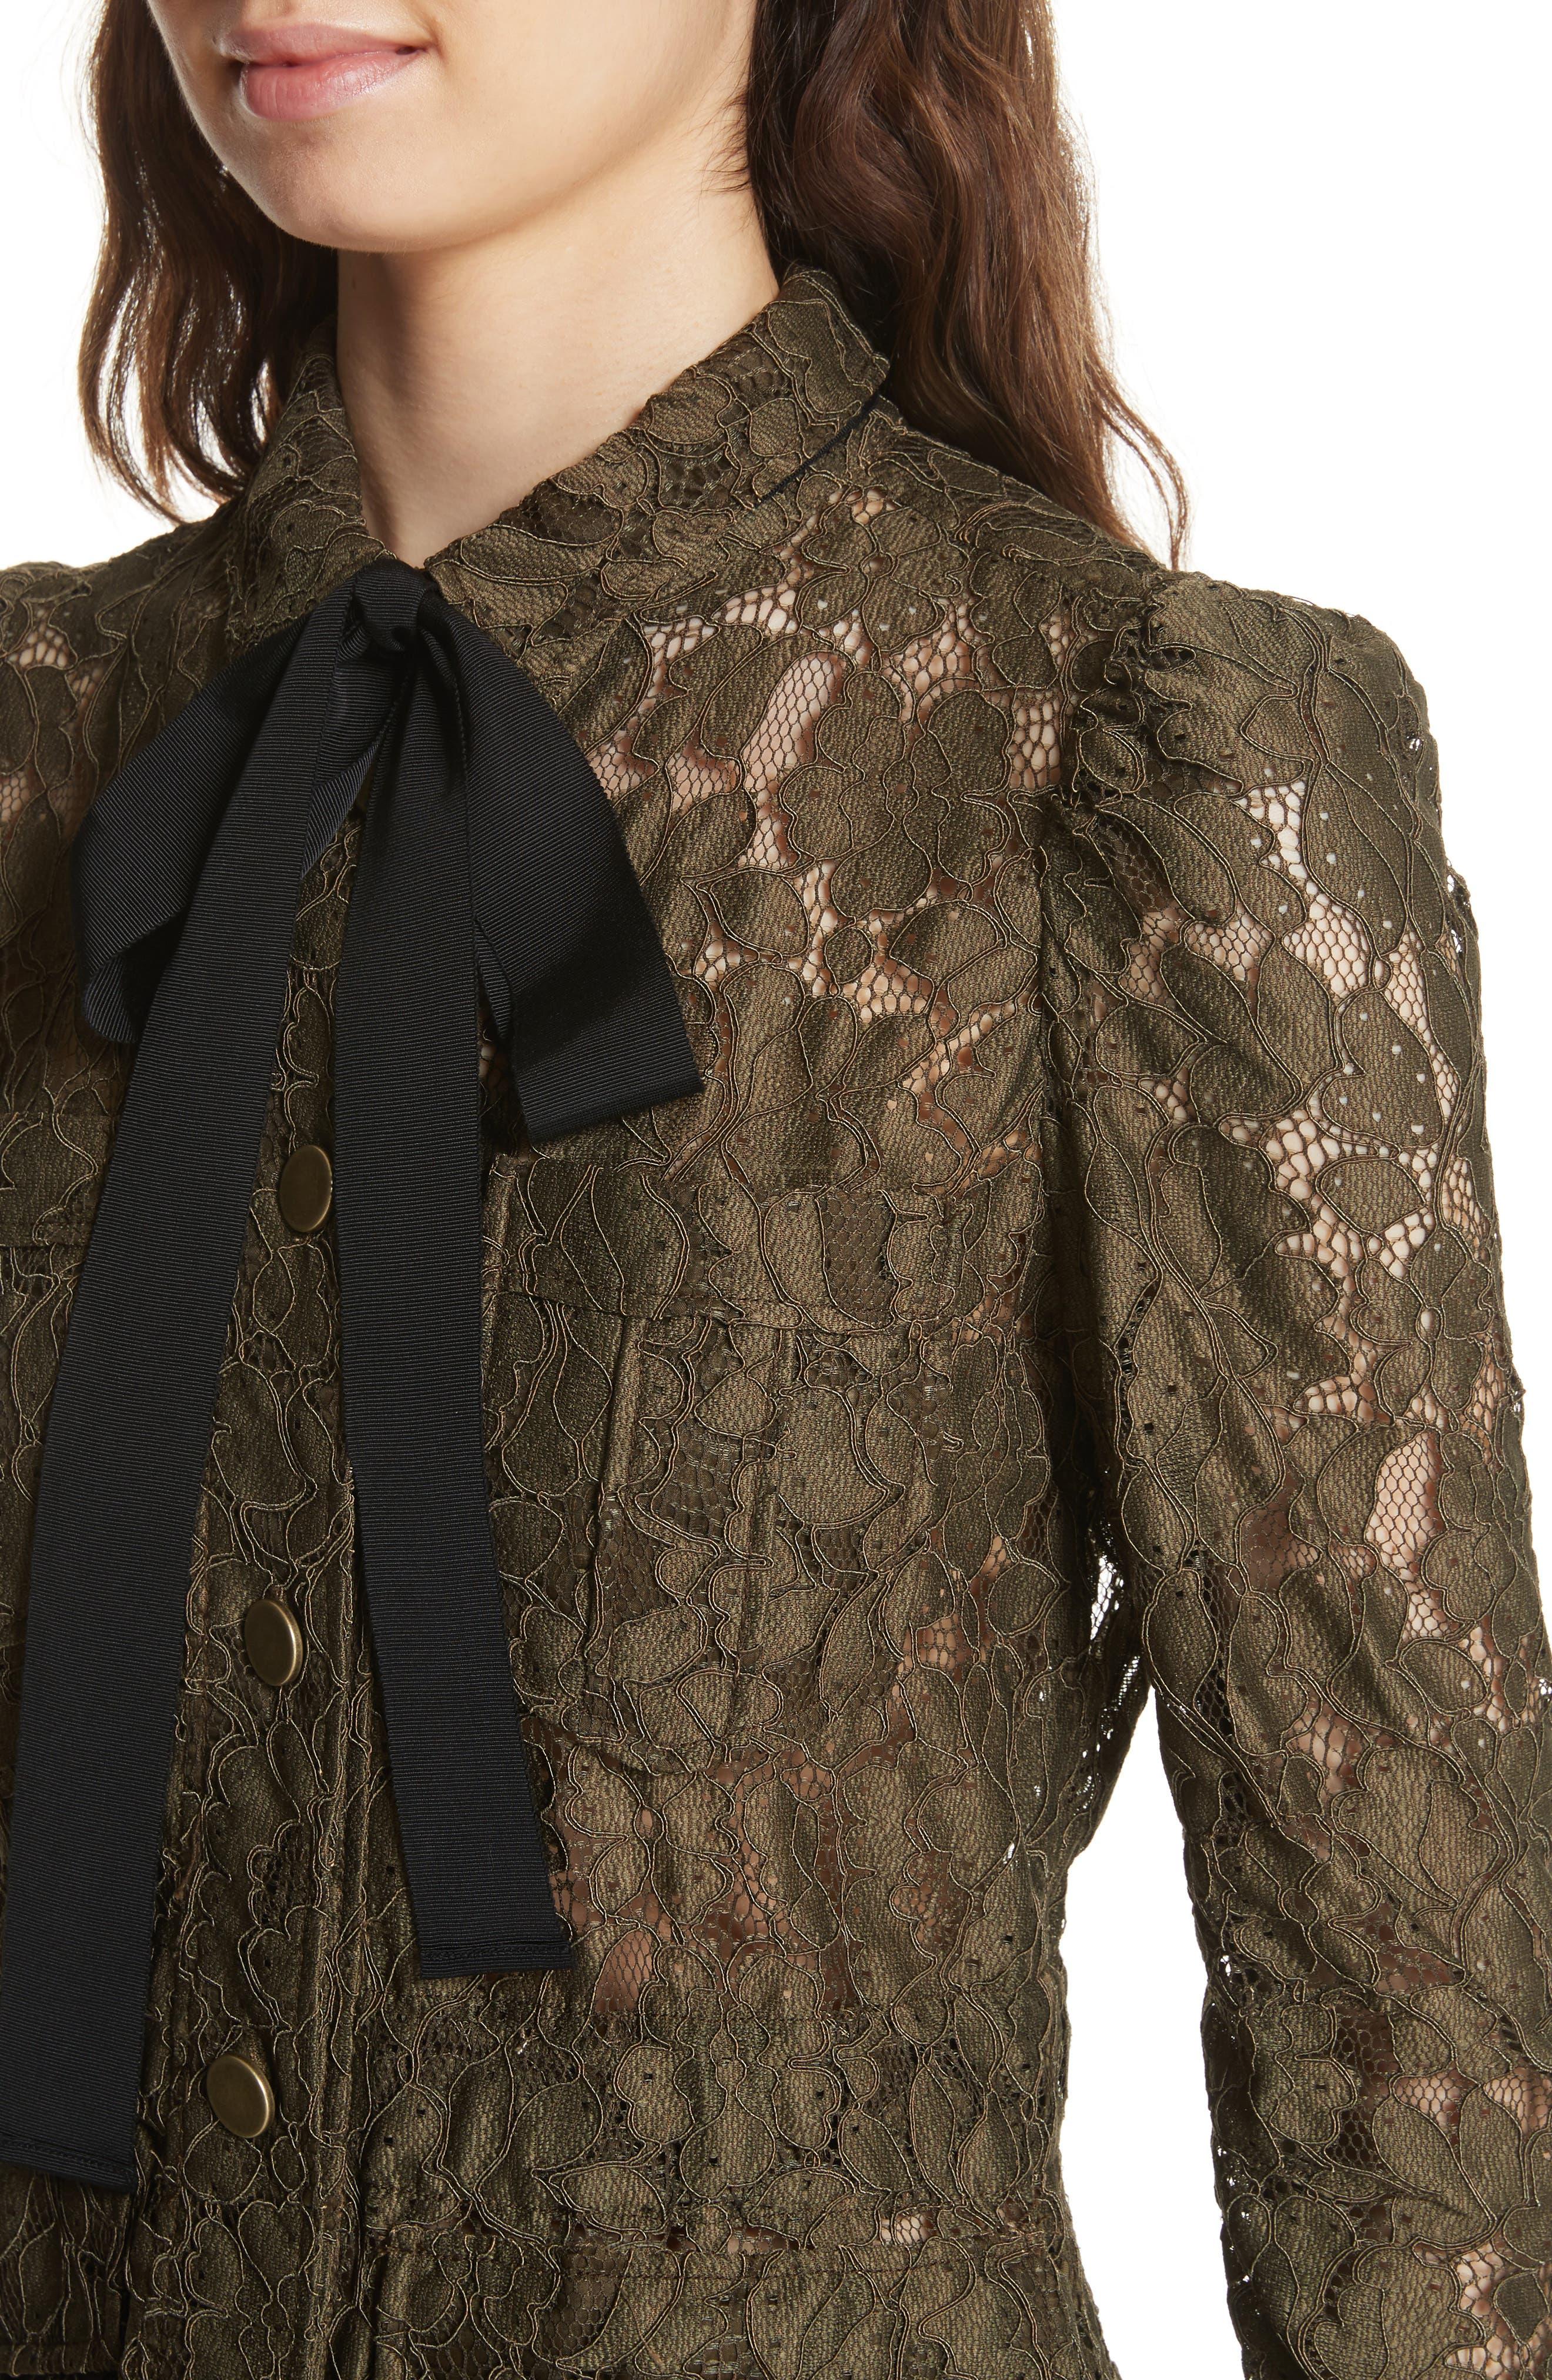 Daniela Tie Neck Lace Army Jacket,                             Alternate thumbnail 4, color,                             310